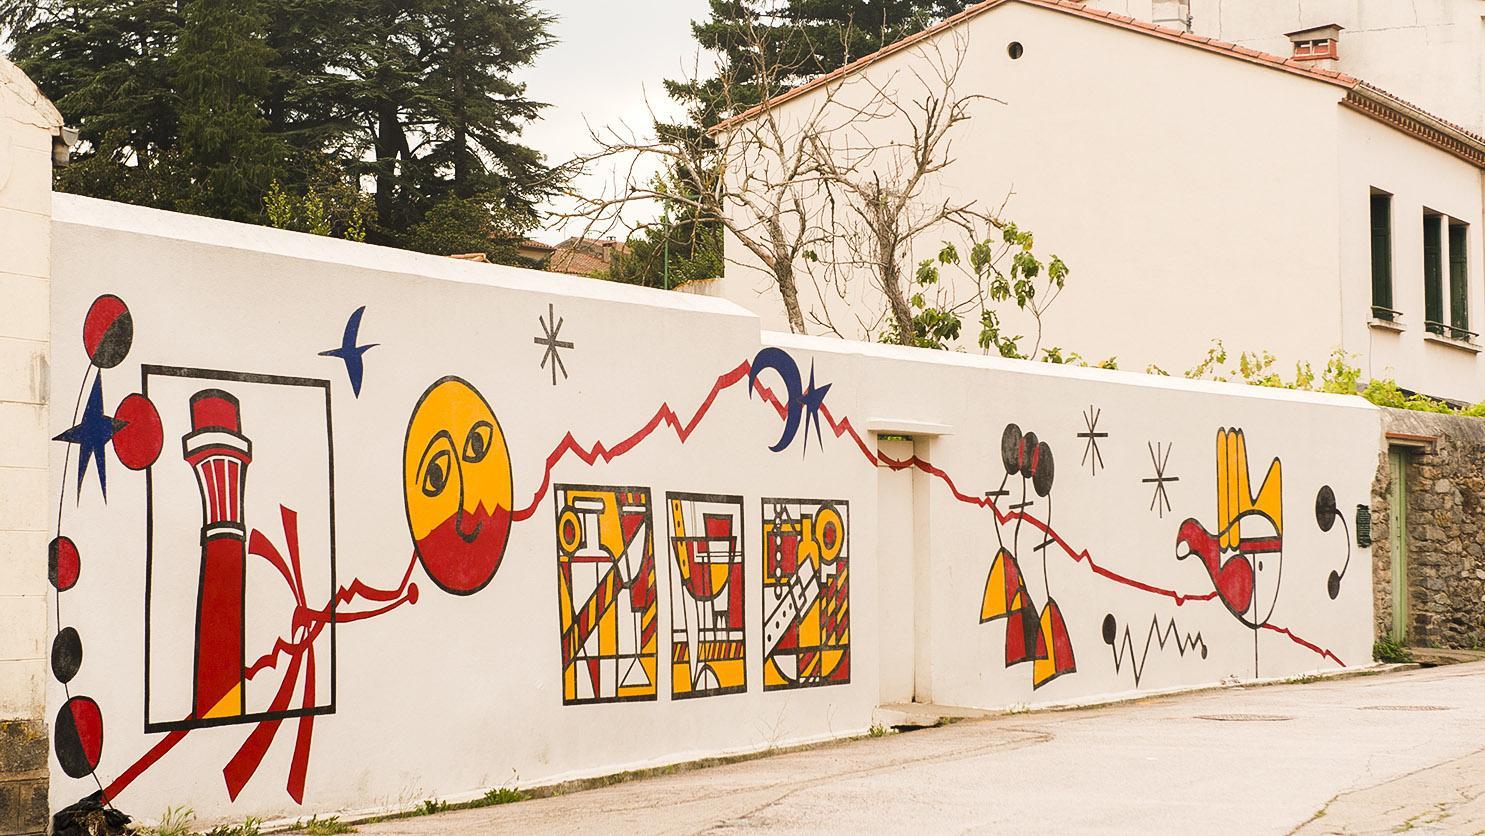 Arles-sur-Tech: Wandbild bei Le Moulin. Foto: Hilke Maunder